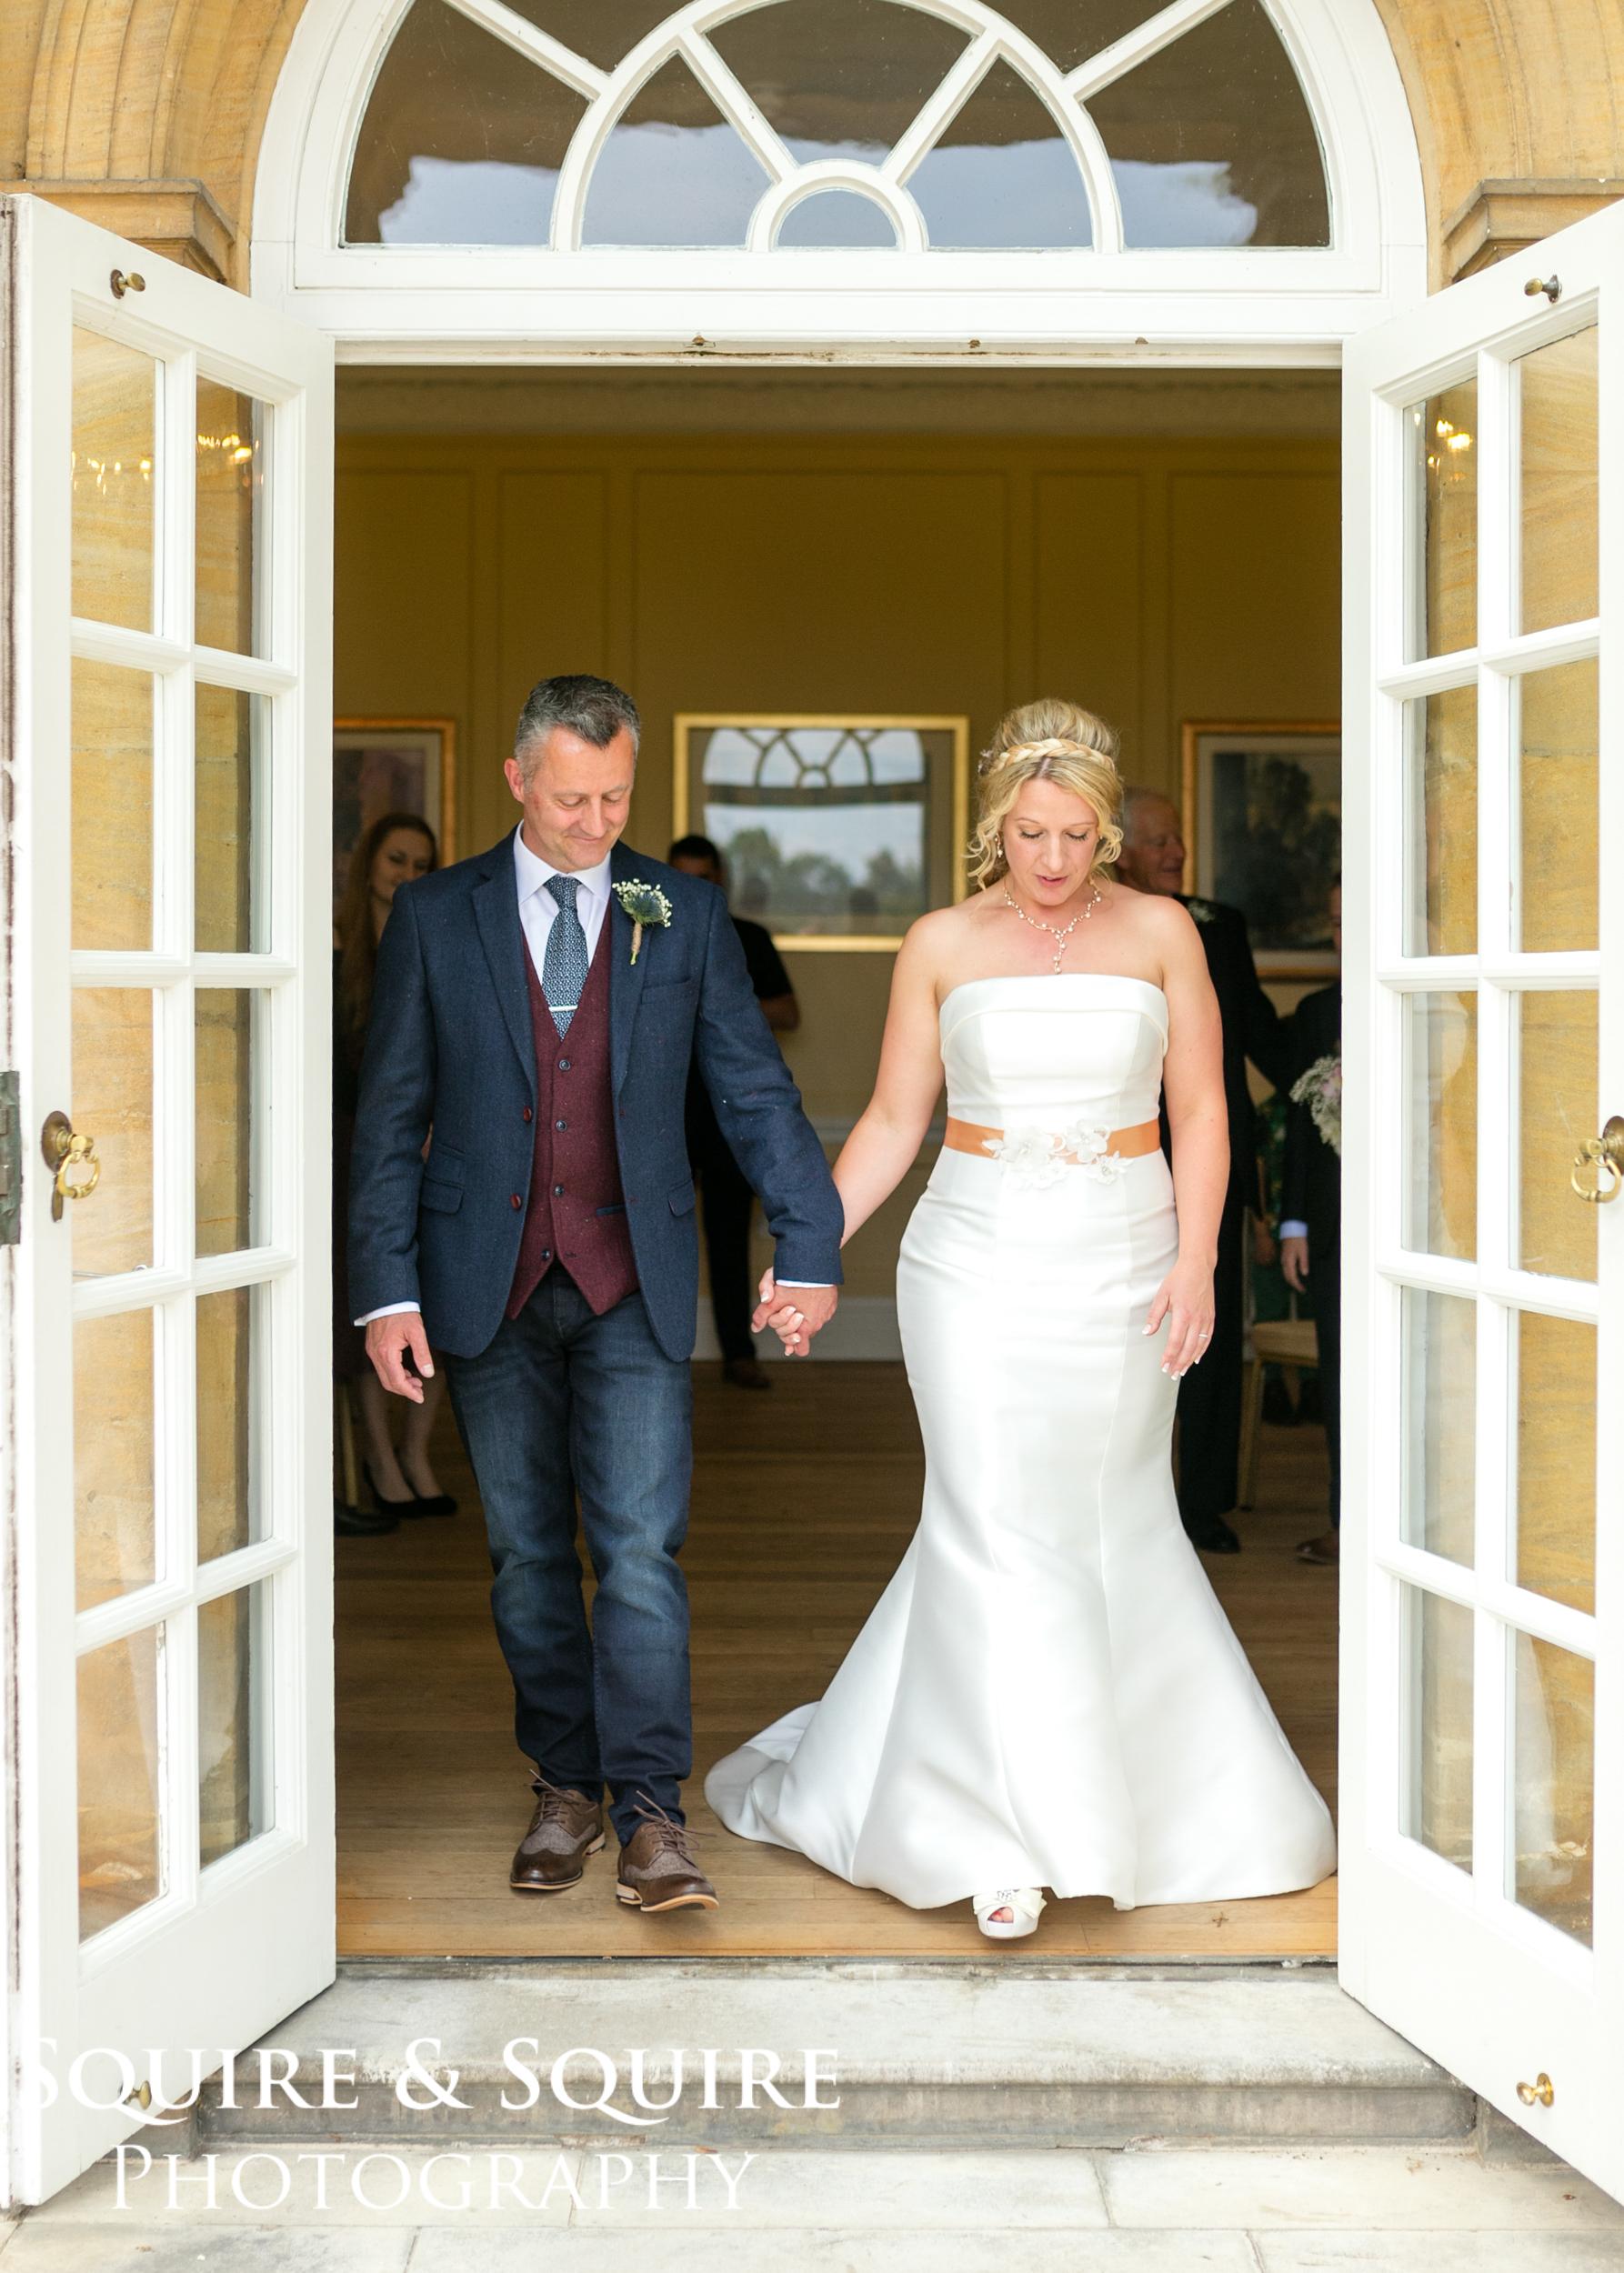 wedding_photography_catthorpe Manor (41 of 66).jpg